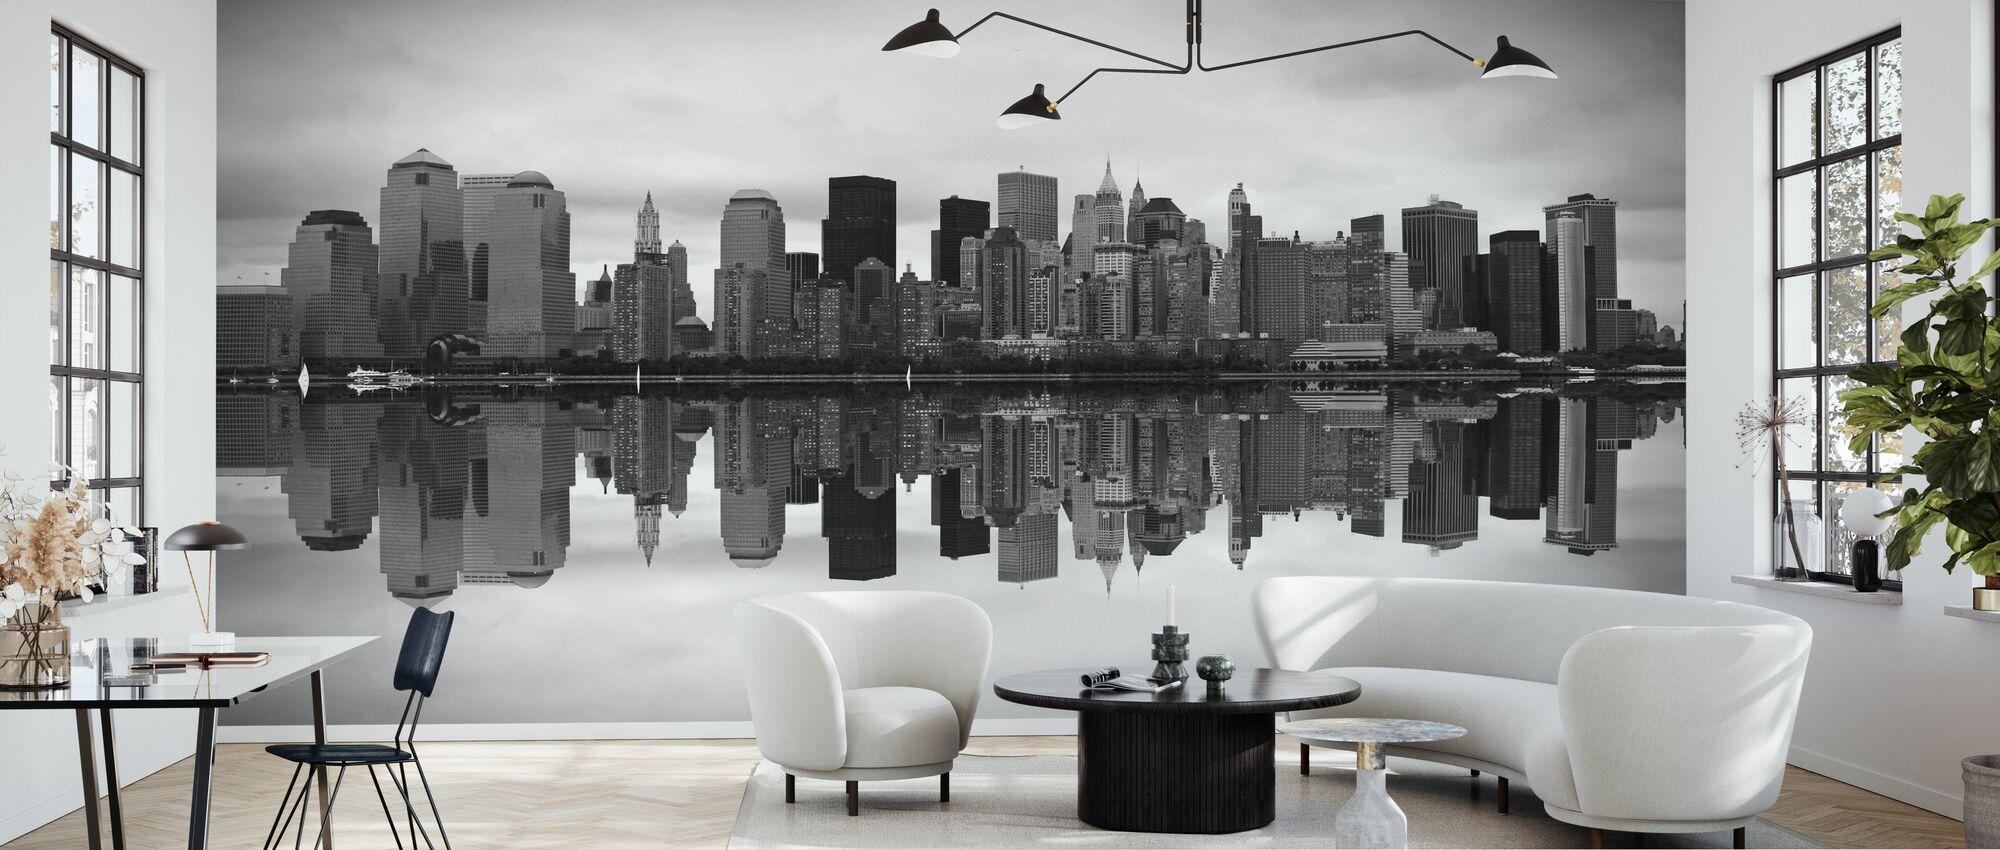 Manhattan - Wallpaper - Living Room